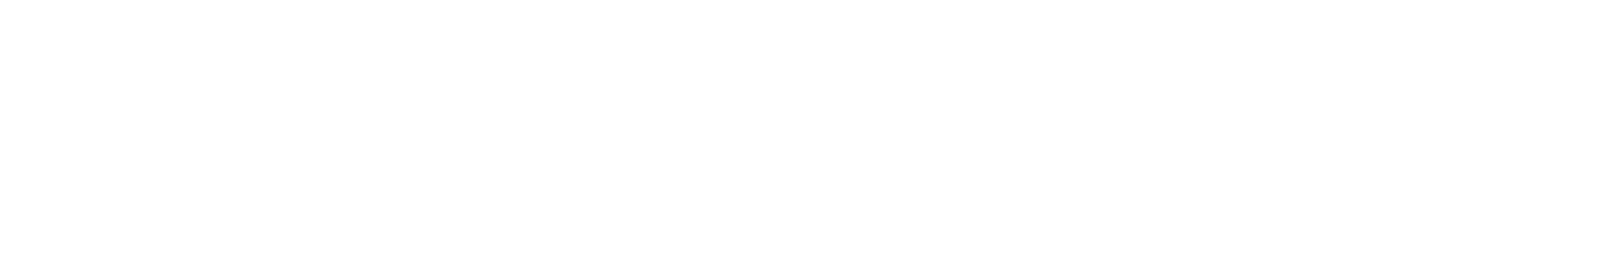 Datacapt